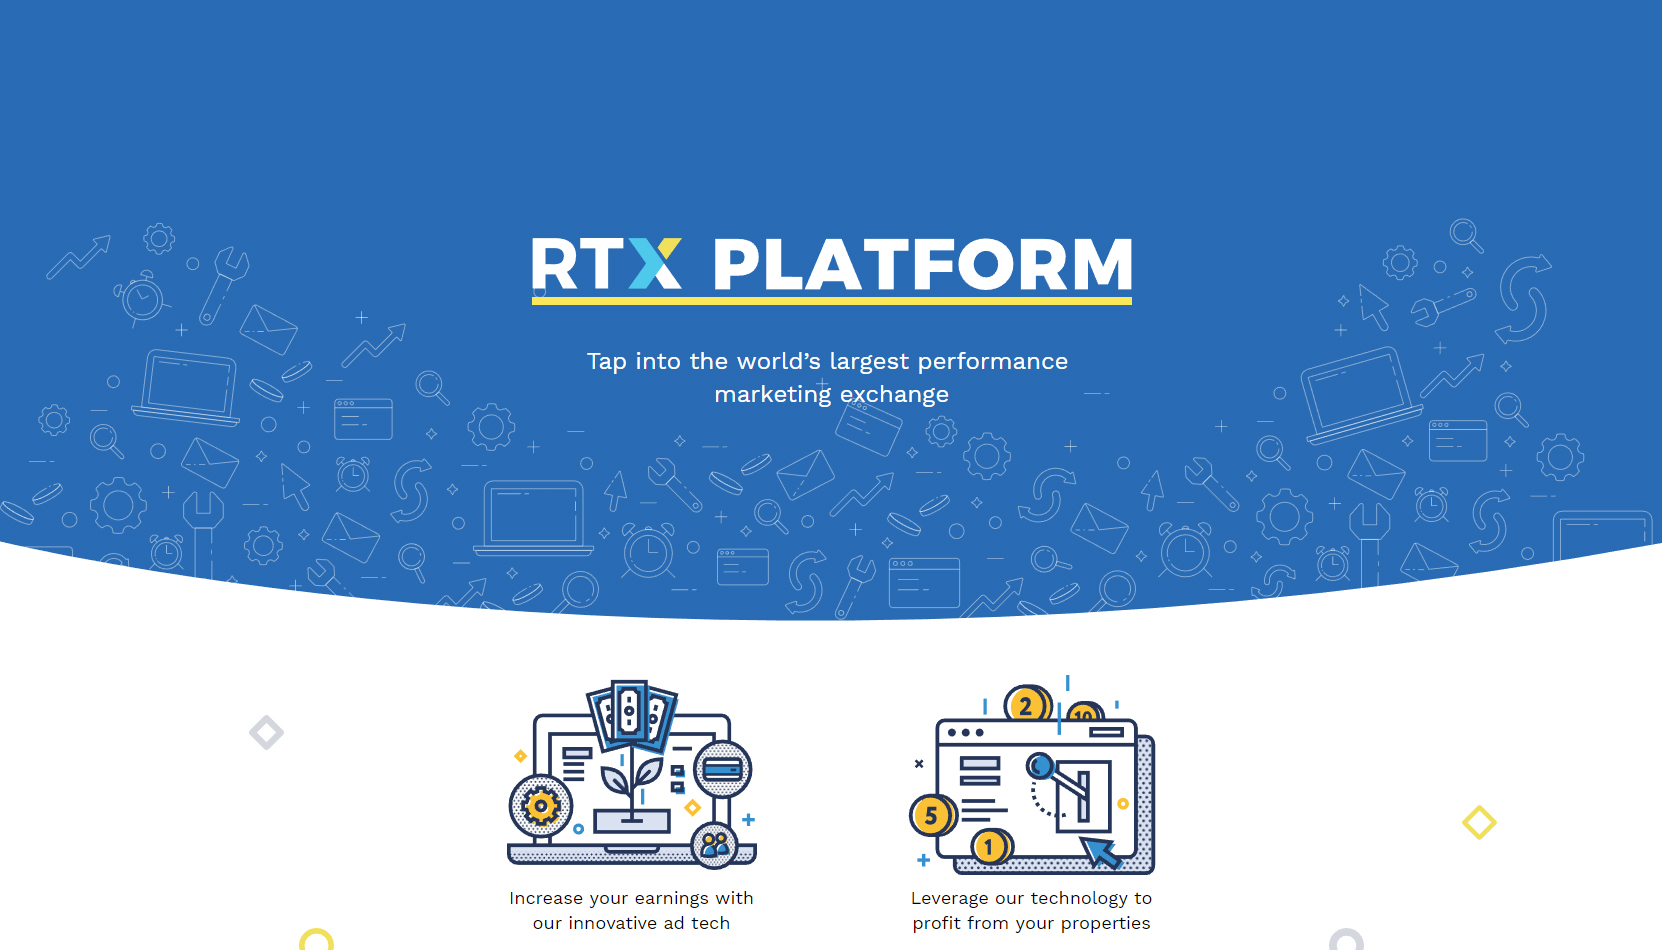 Receive +$100 Bonus on RTX Platform Through MaxBounty